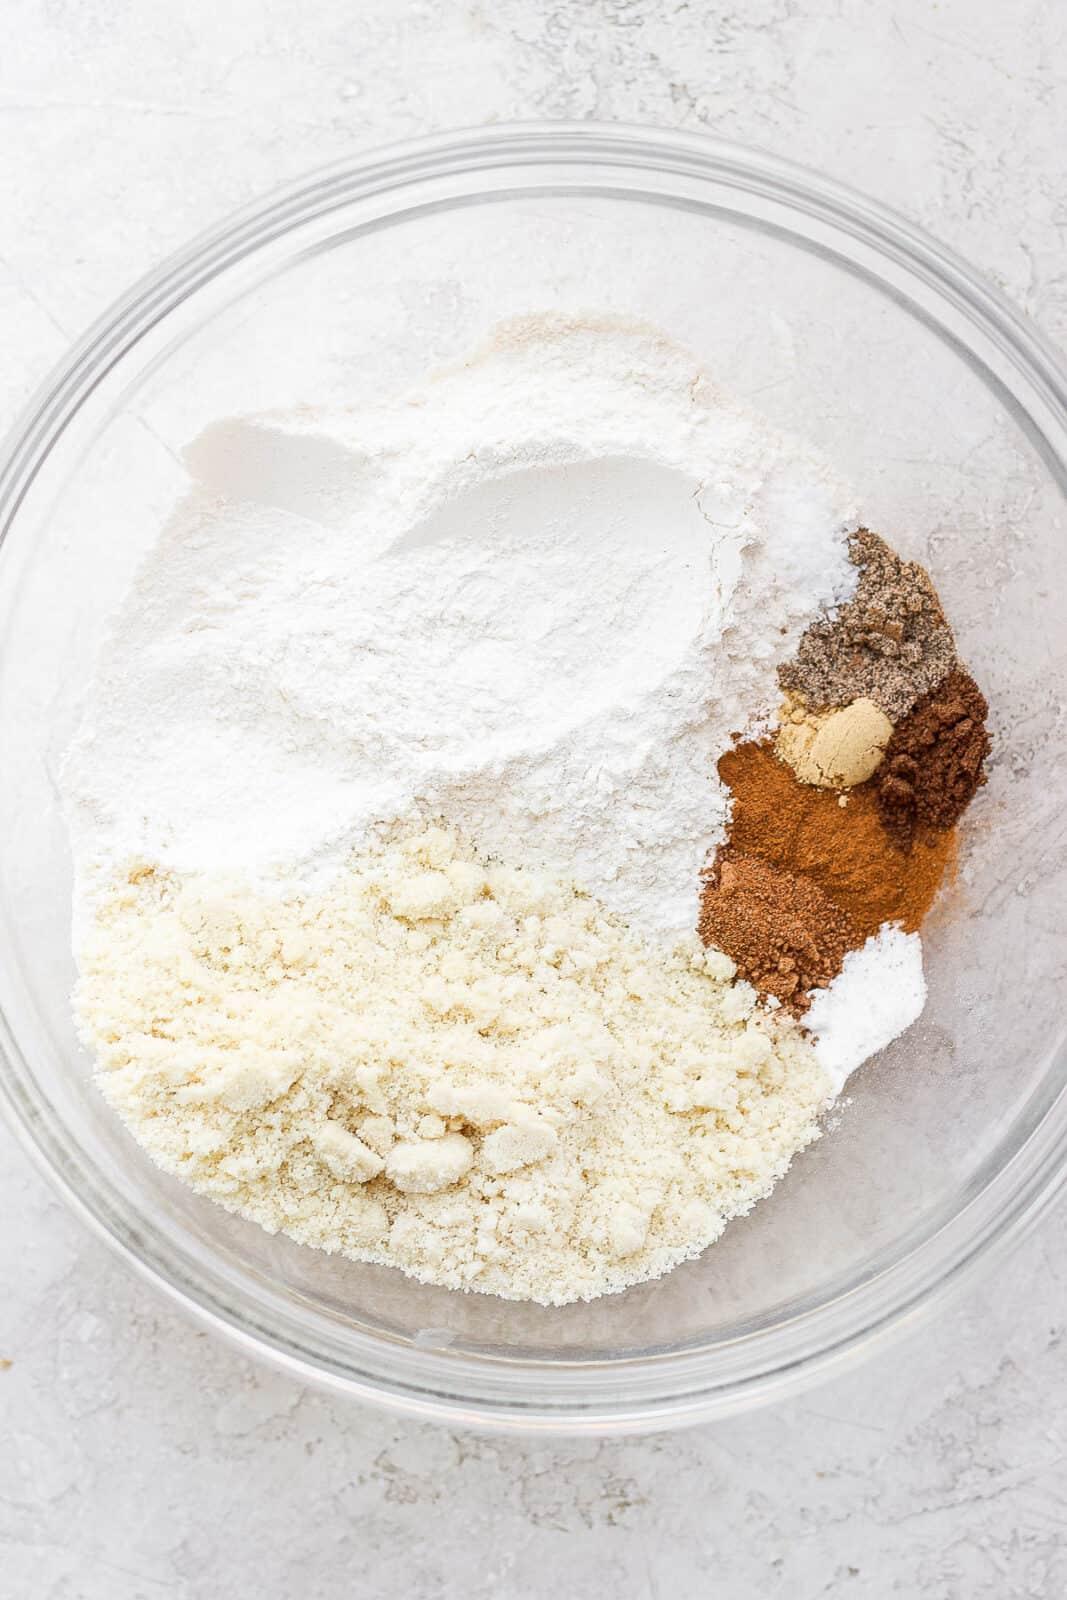 Dry ingredients for apple cinnamon muffins.